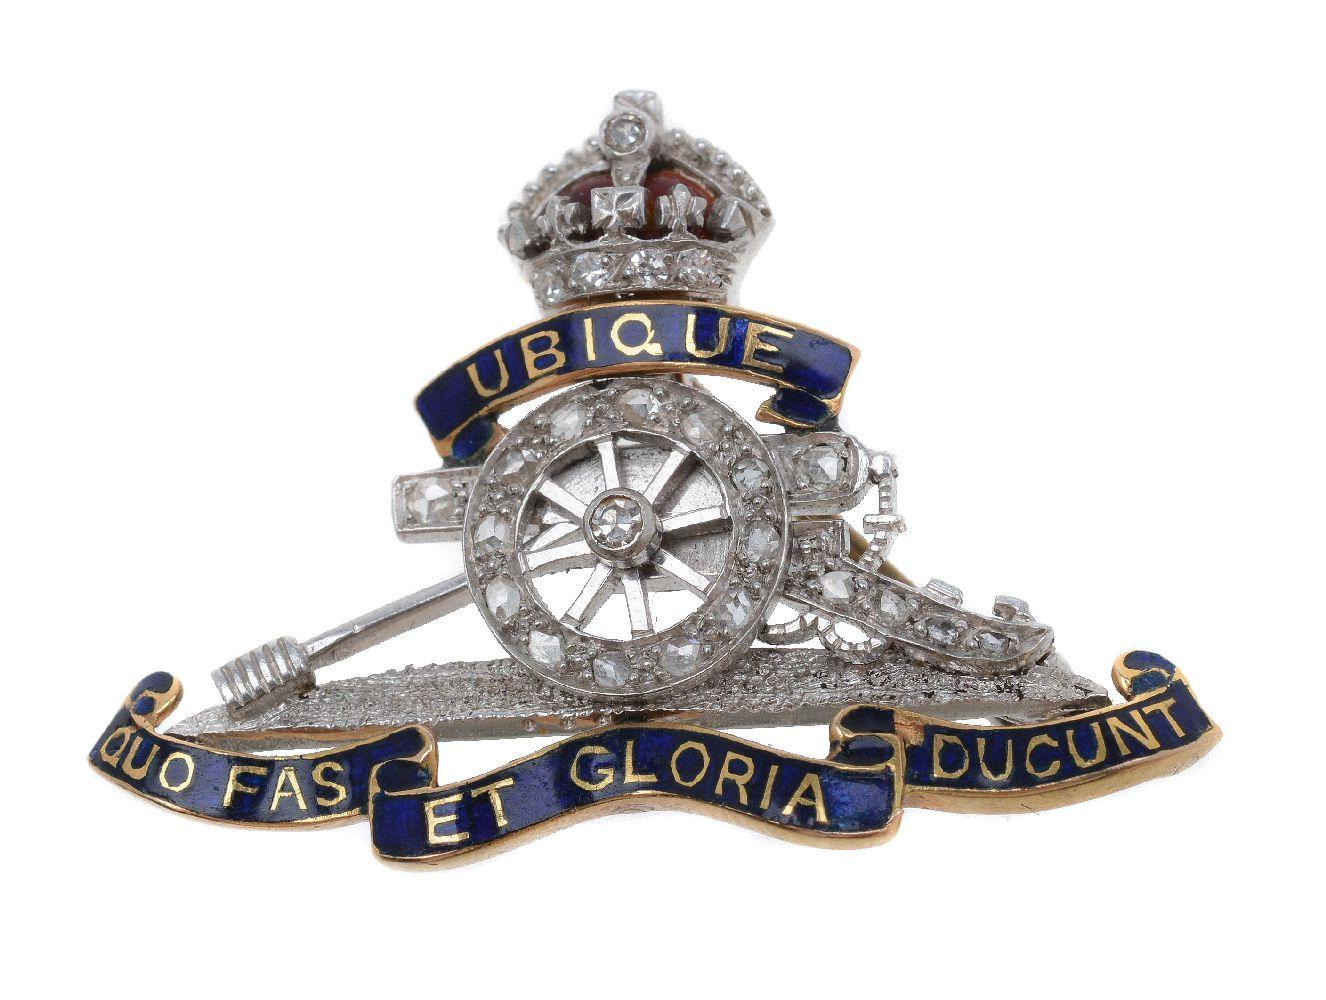 Lot 37 - A mid 20th century Royal Artillery diamond set sweetheart brooch